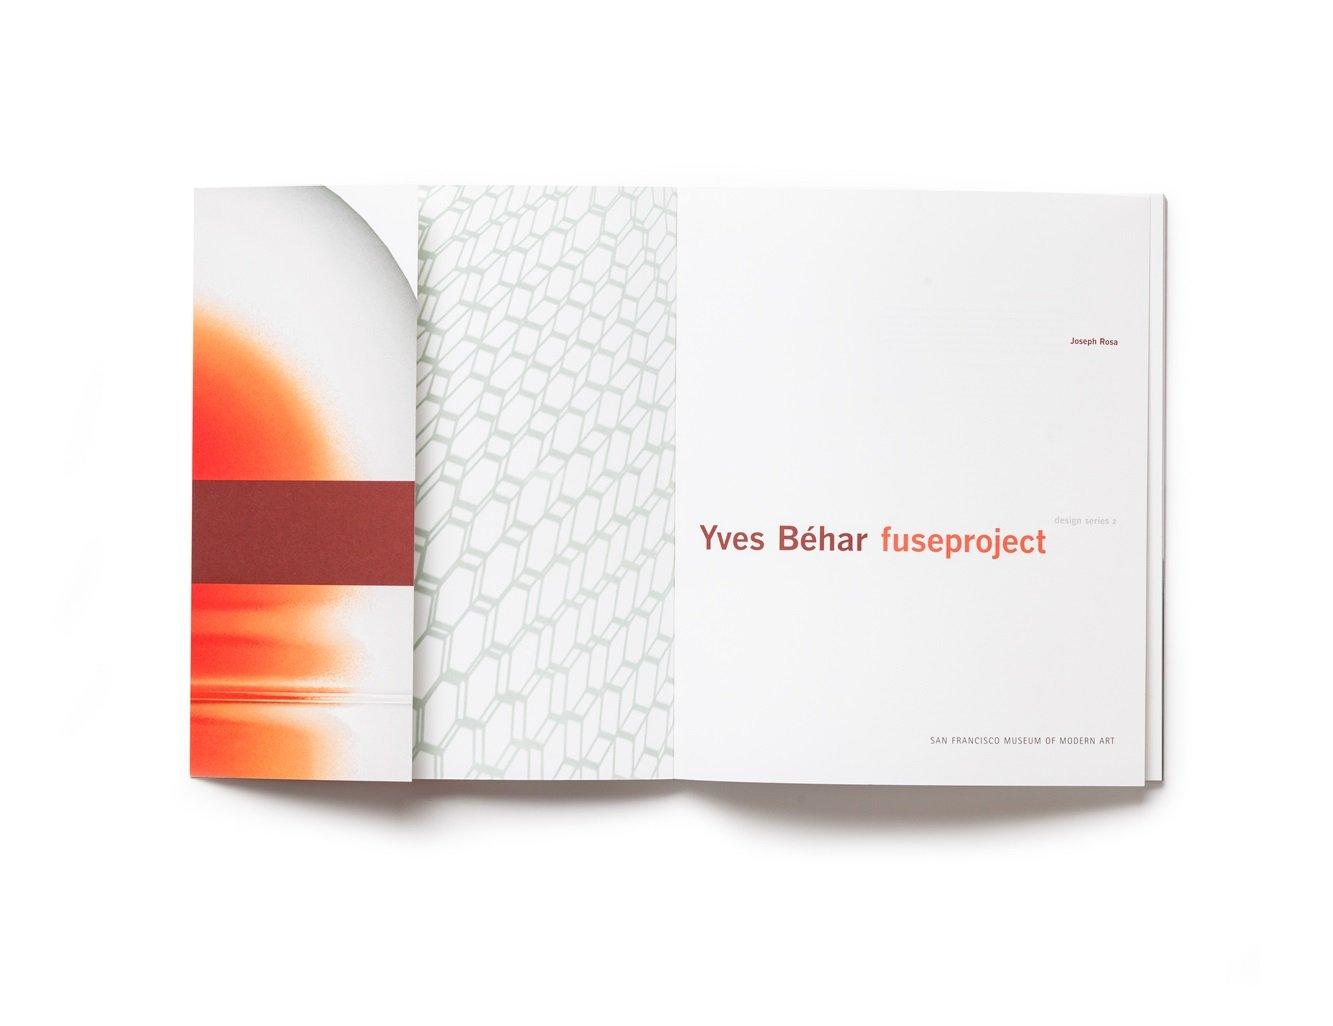 Yves Béhar fuseproject: design series 2publication front endsheet